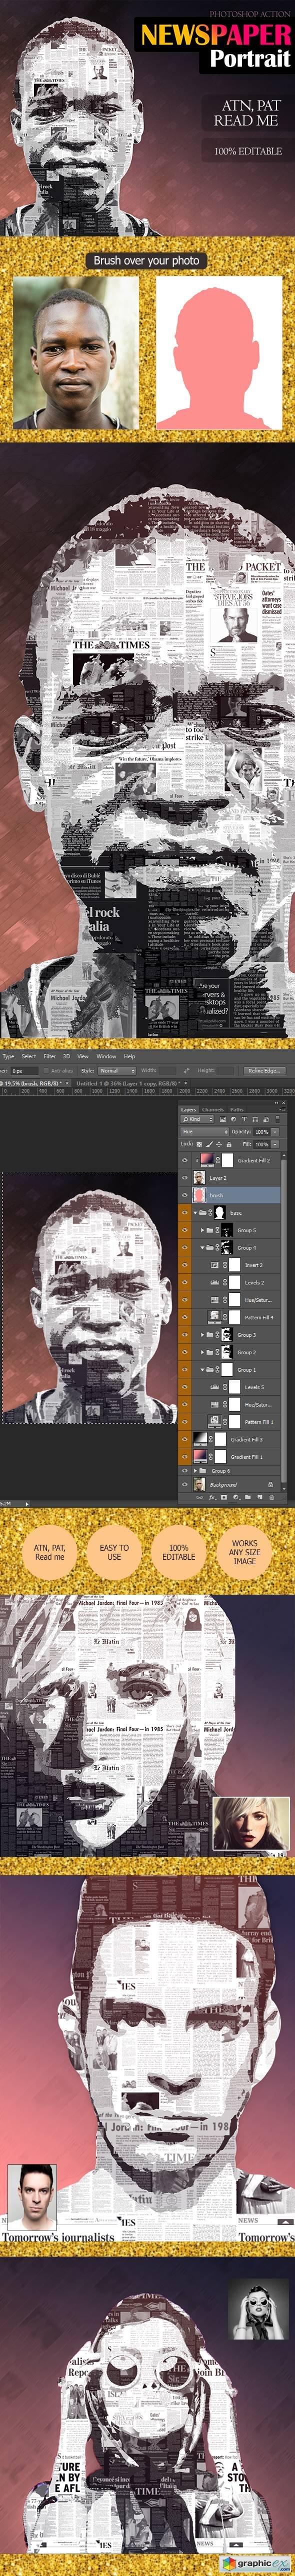 Newspaper Portrait Effect 13855434 » Free Download Vector